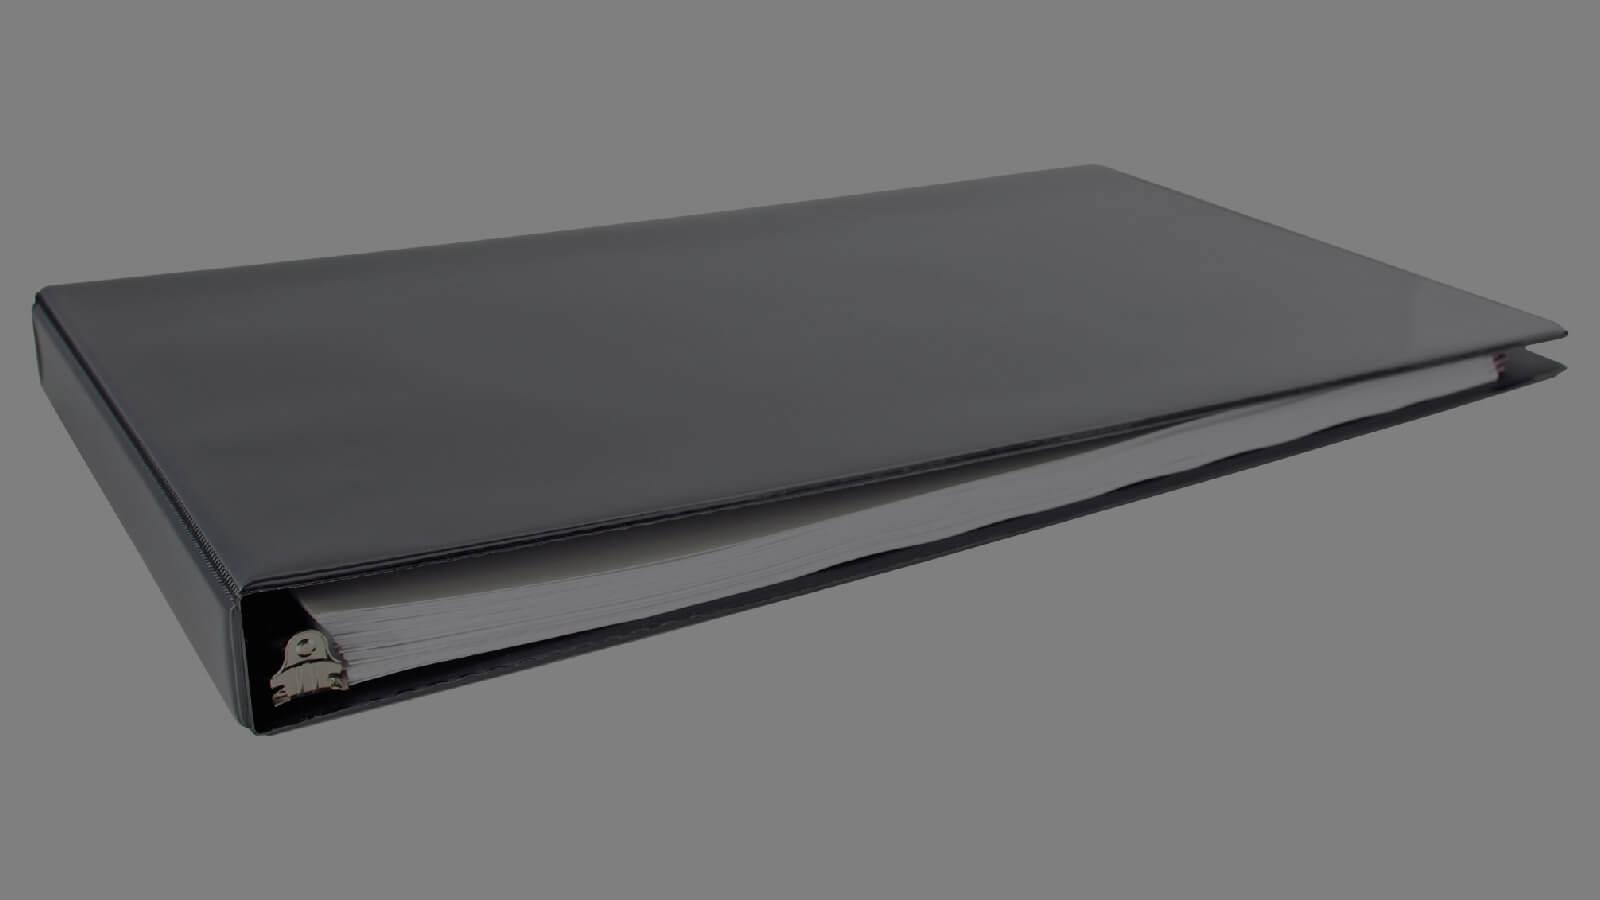 11x17 Com Binders Dividers Clipboards Filing Amp More